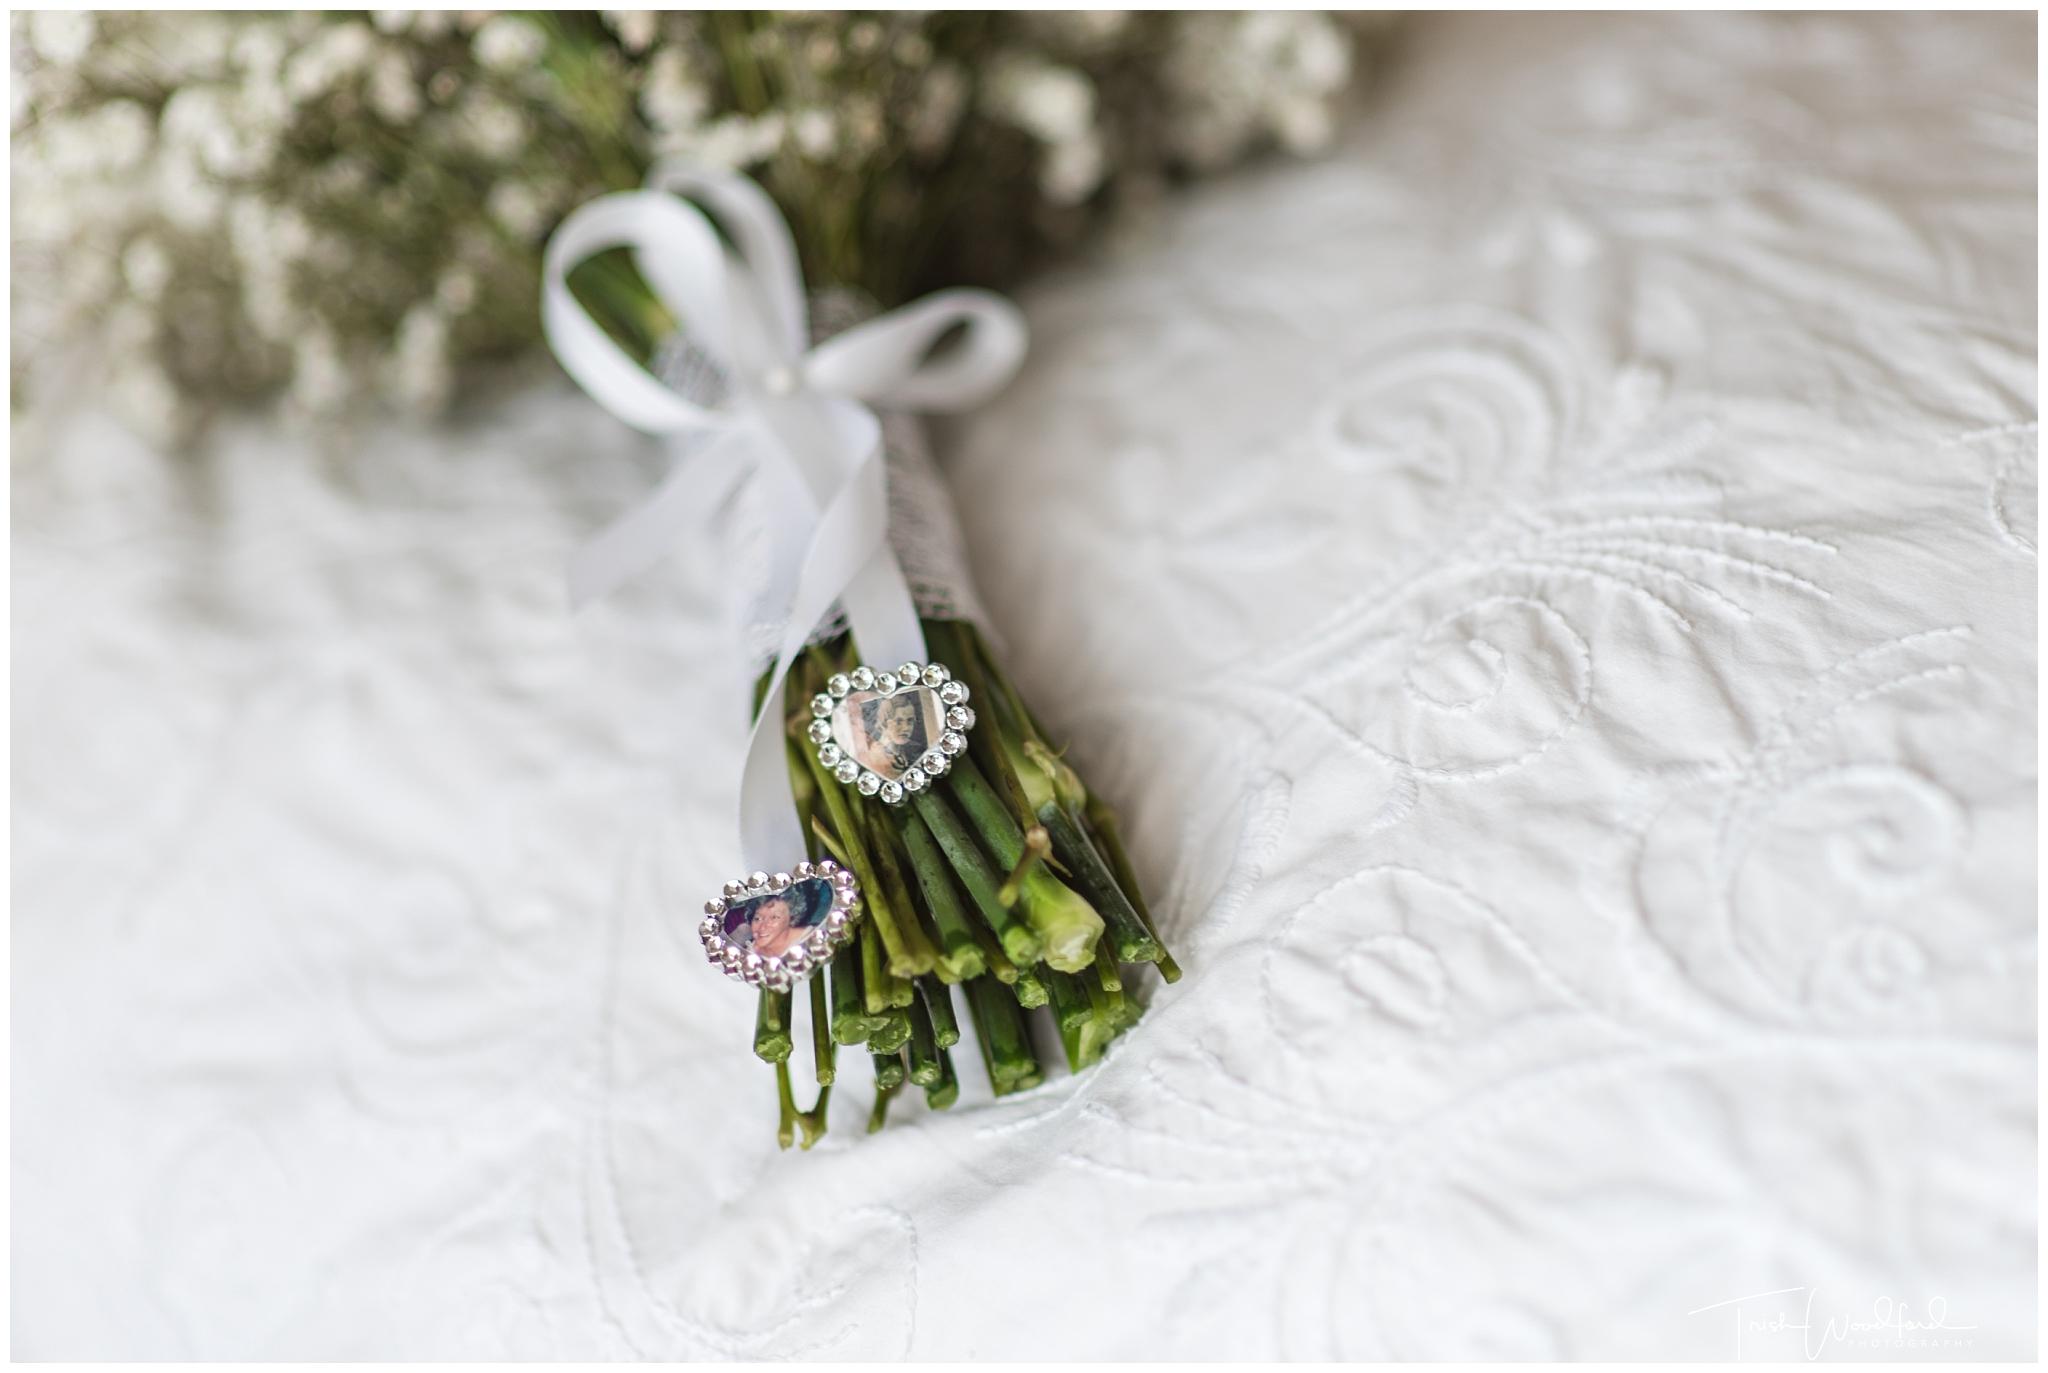 Perth Wedding Details Memorial Charms